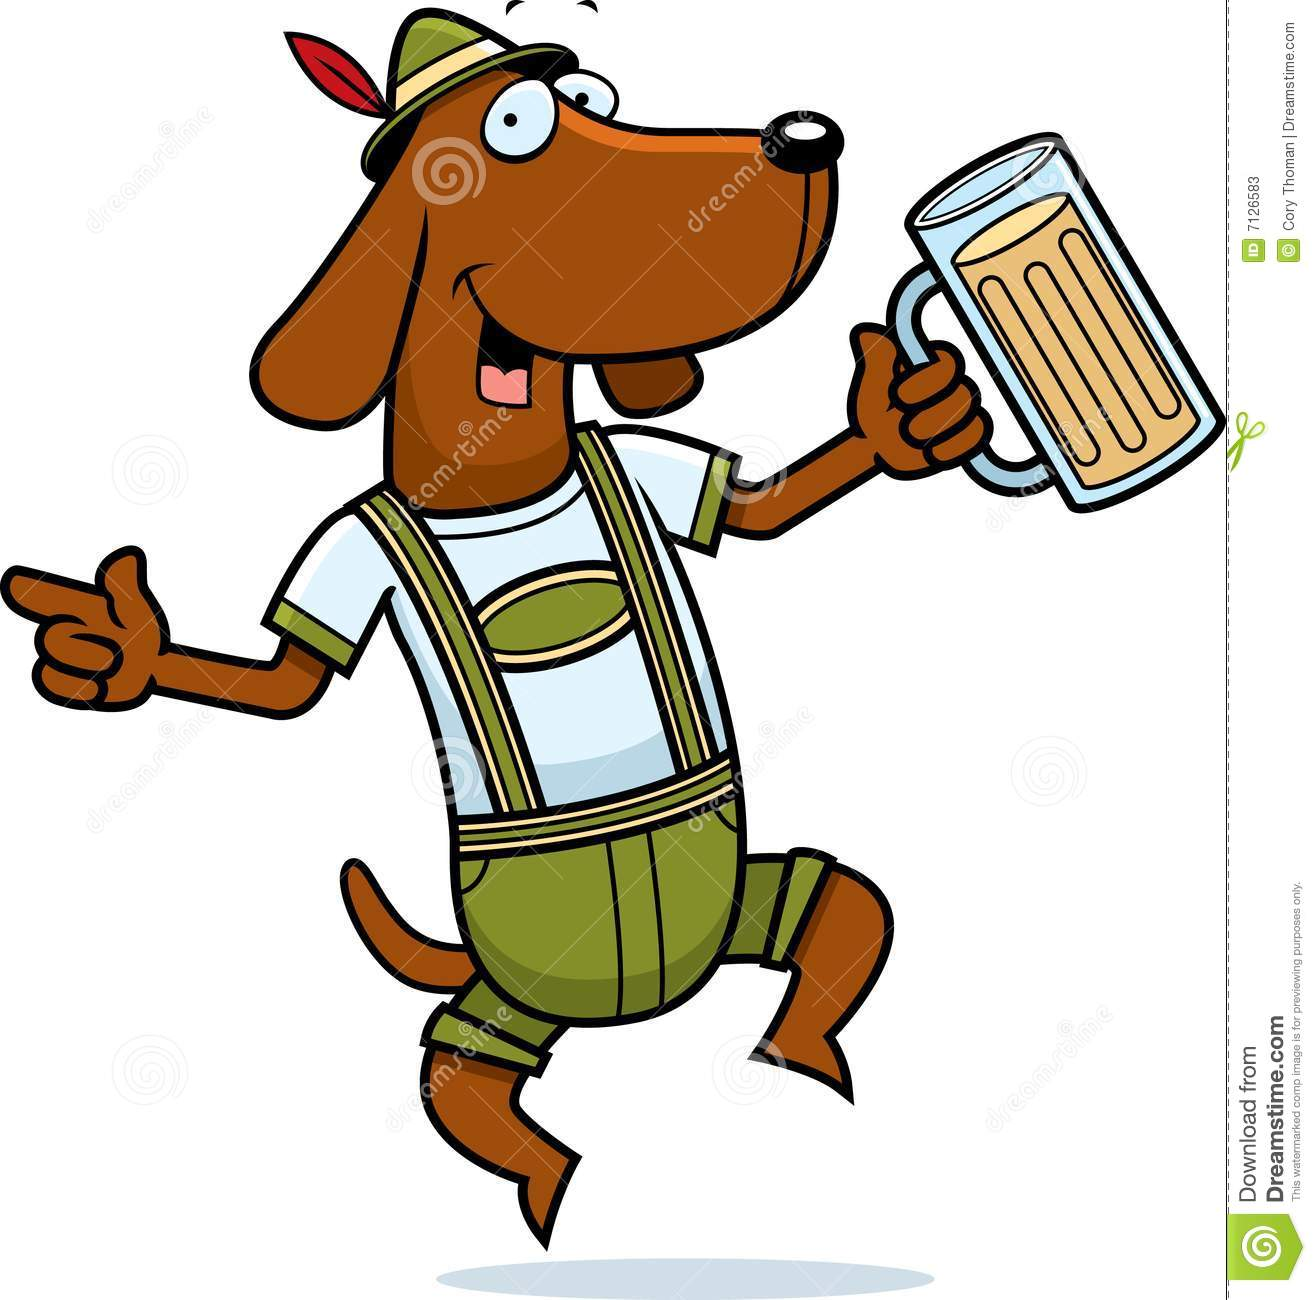 Drink clipart german beer Beer Clipart Dog German cliparts